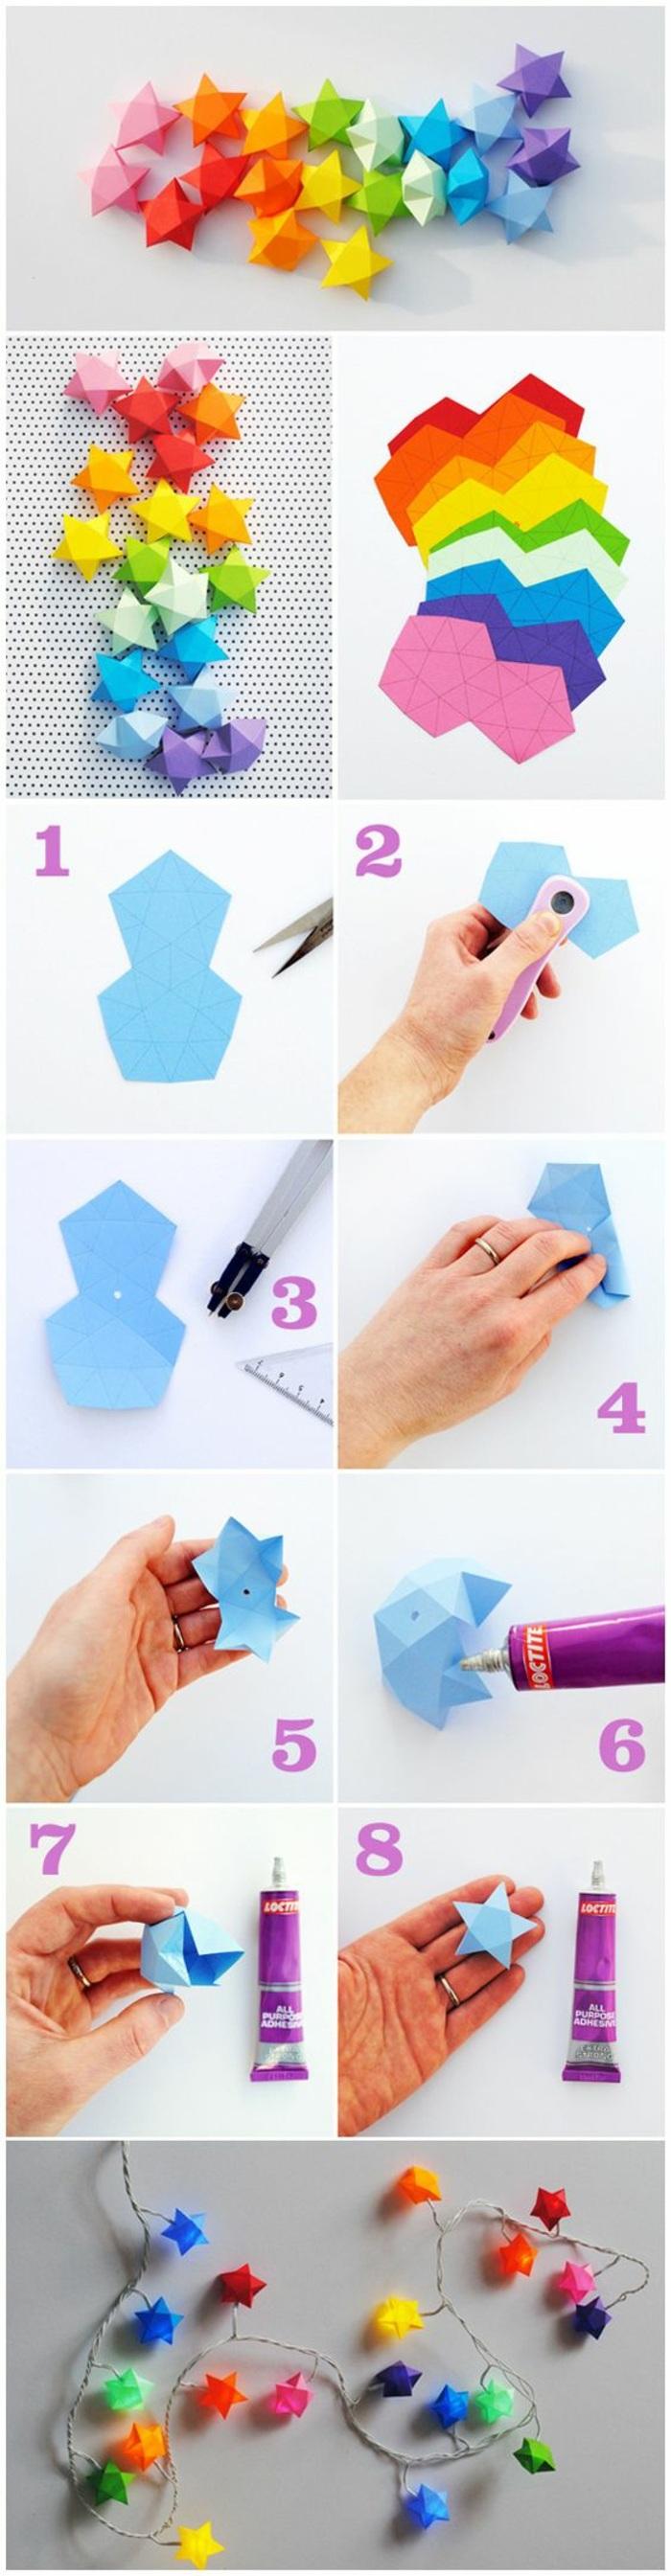 girlande selber machen, sterne aus buntem papier falten, kleber